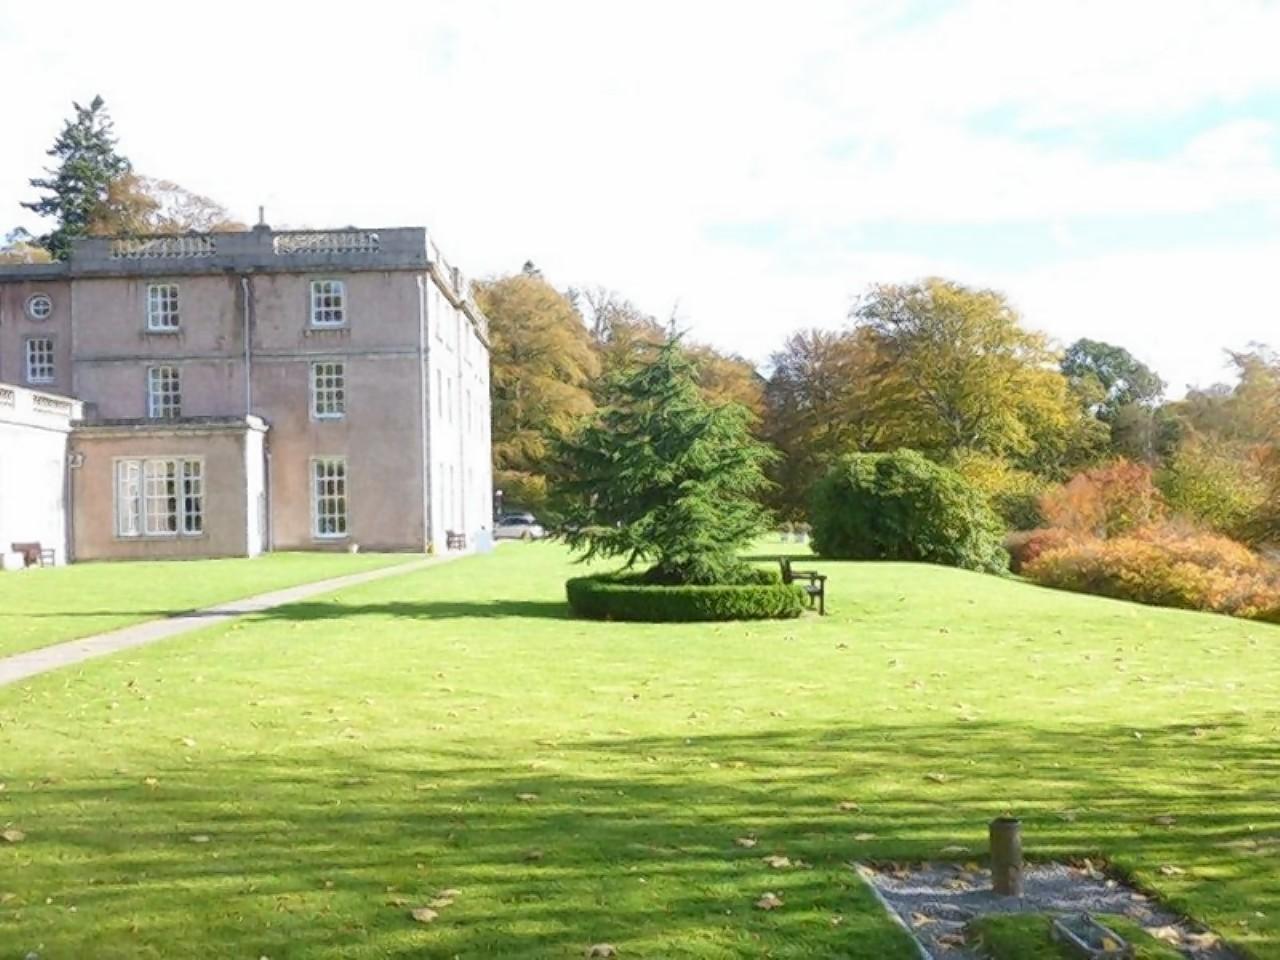 Inchmarlo House, Aberdeenshire